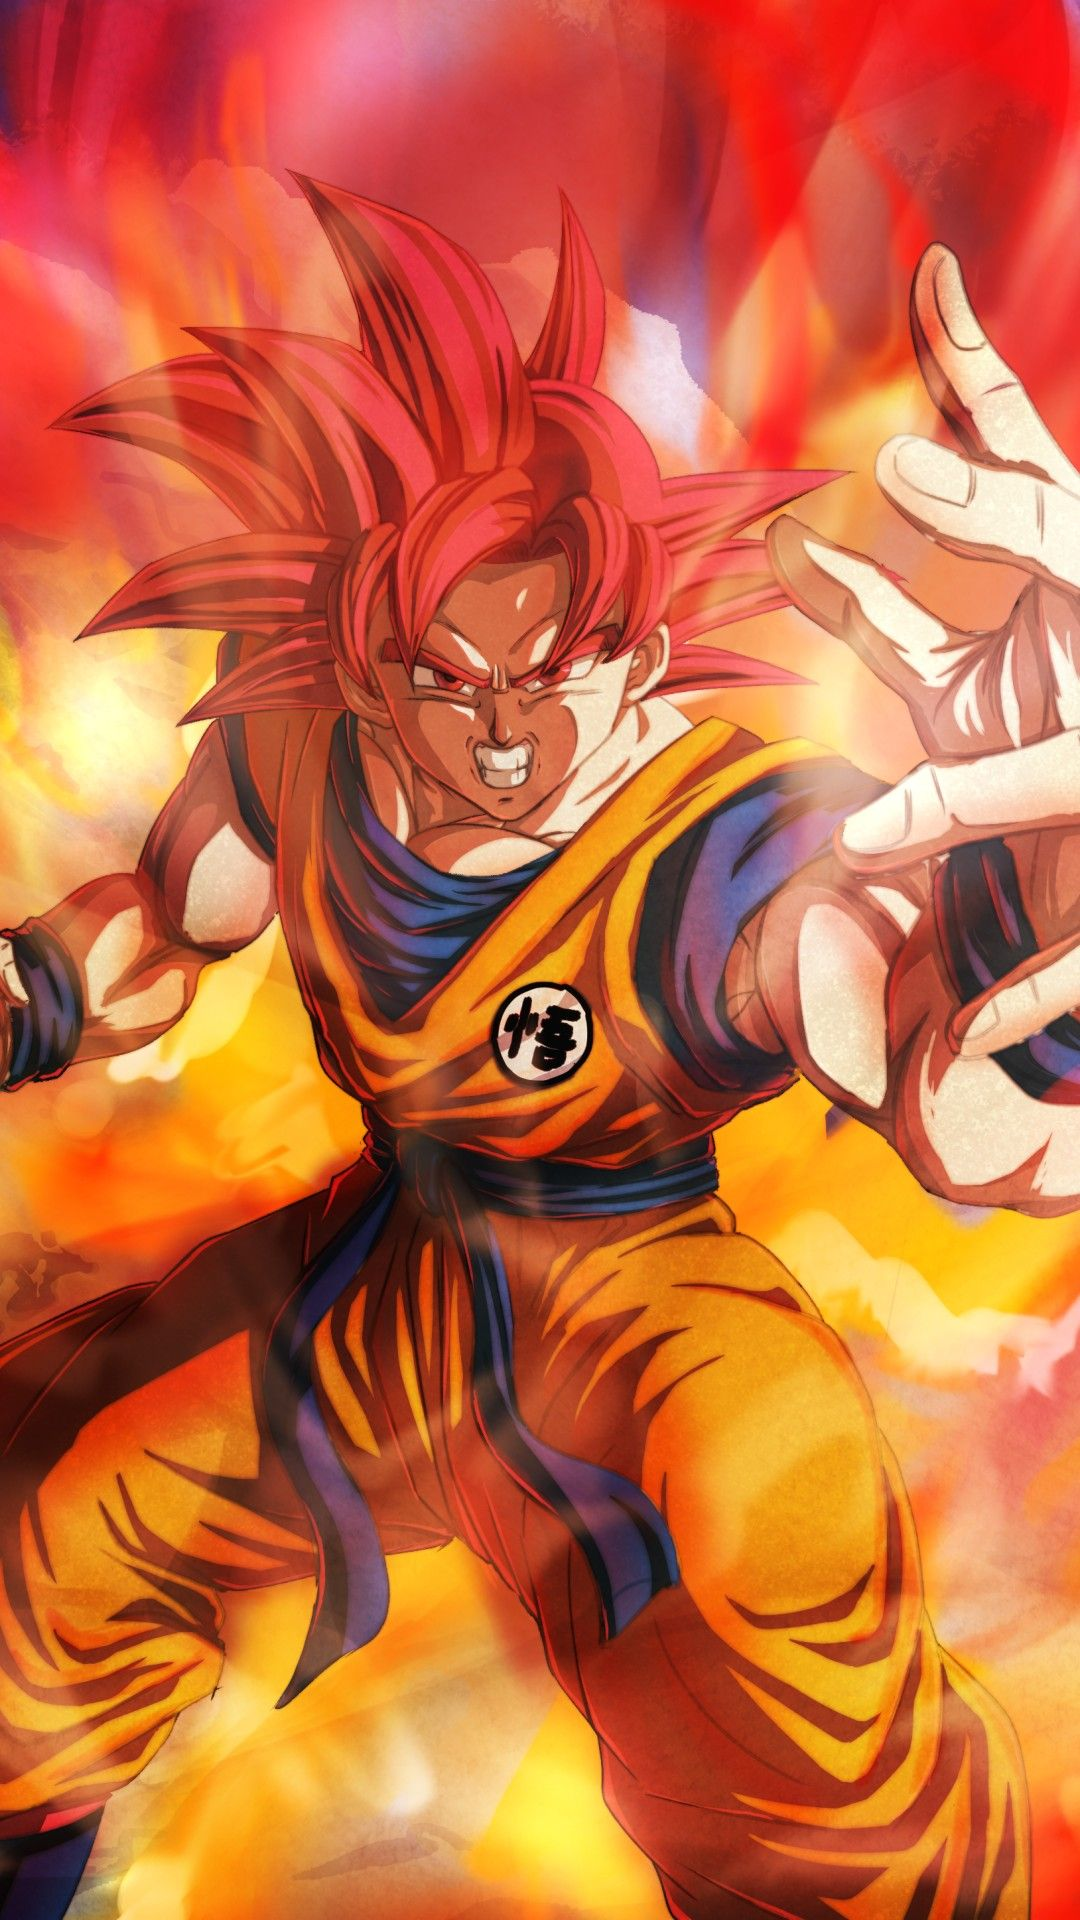 Wallpaper Phone Goku Full Hd Anime Dragon Ball Super Anime Dragon Ball Dragon Ball Super